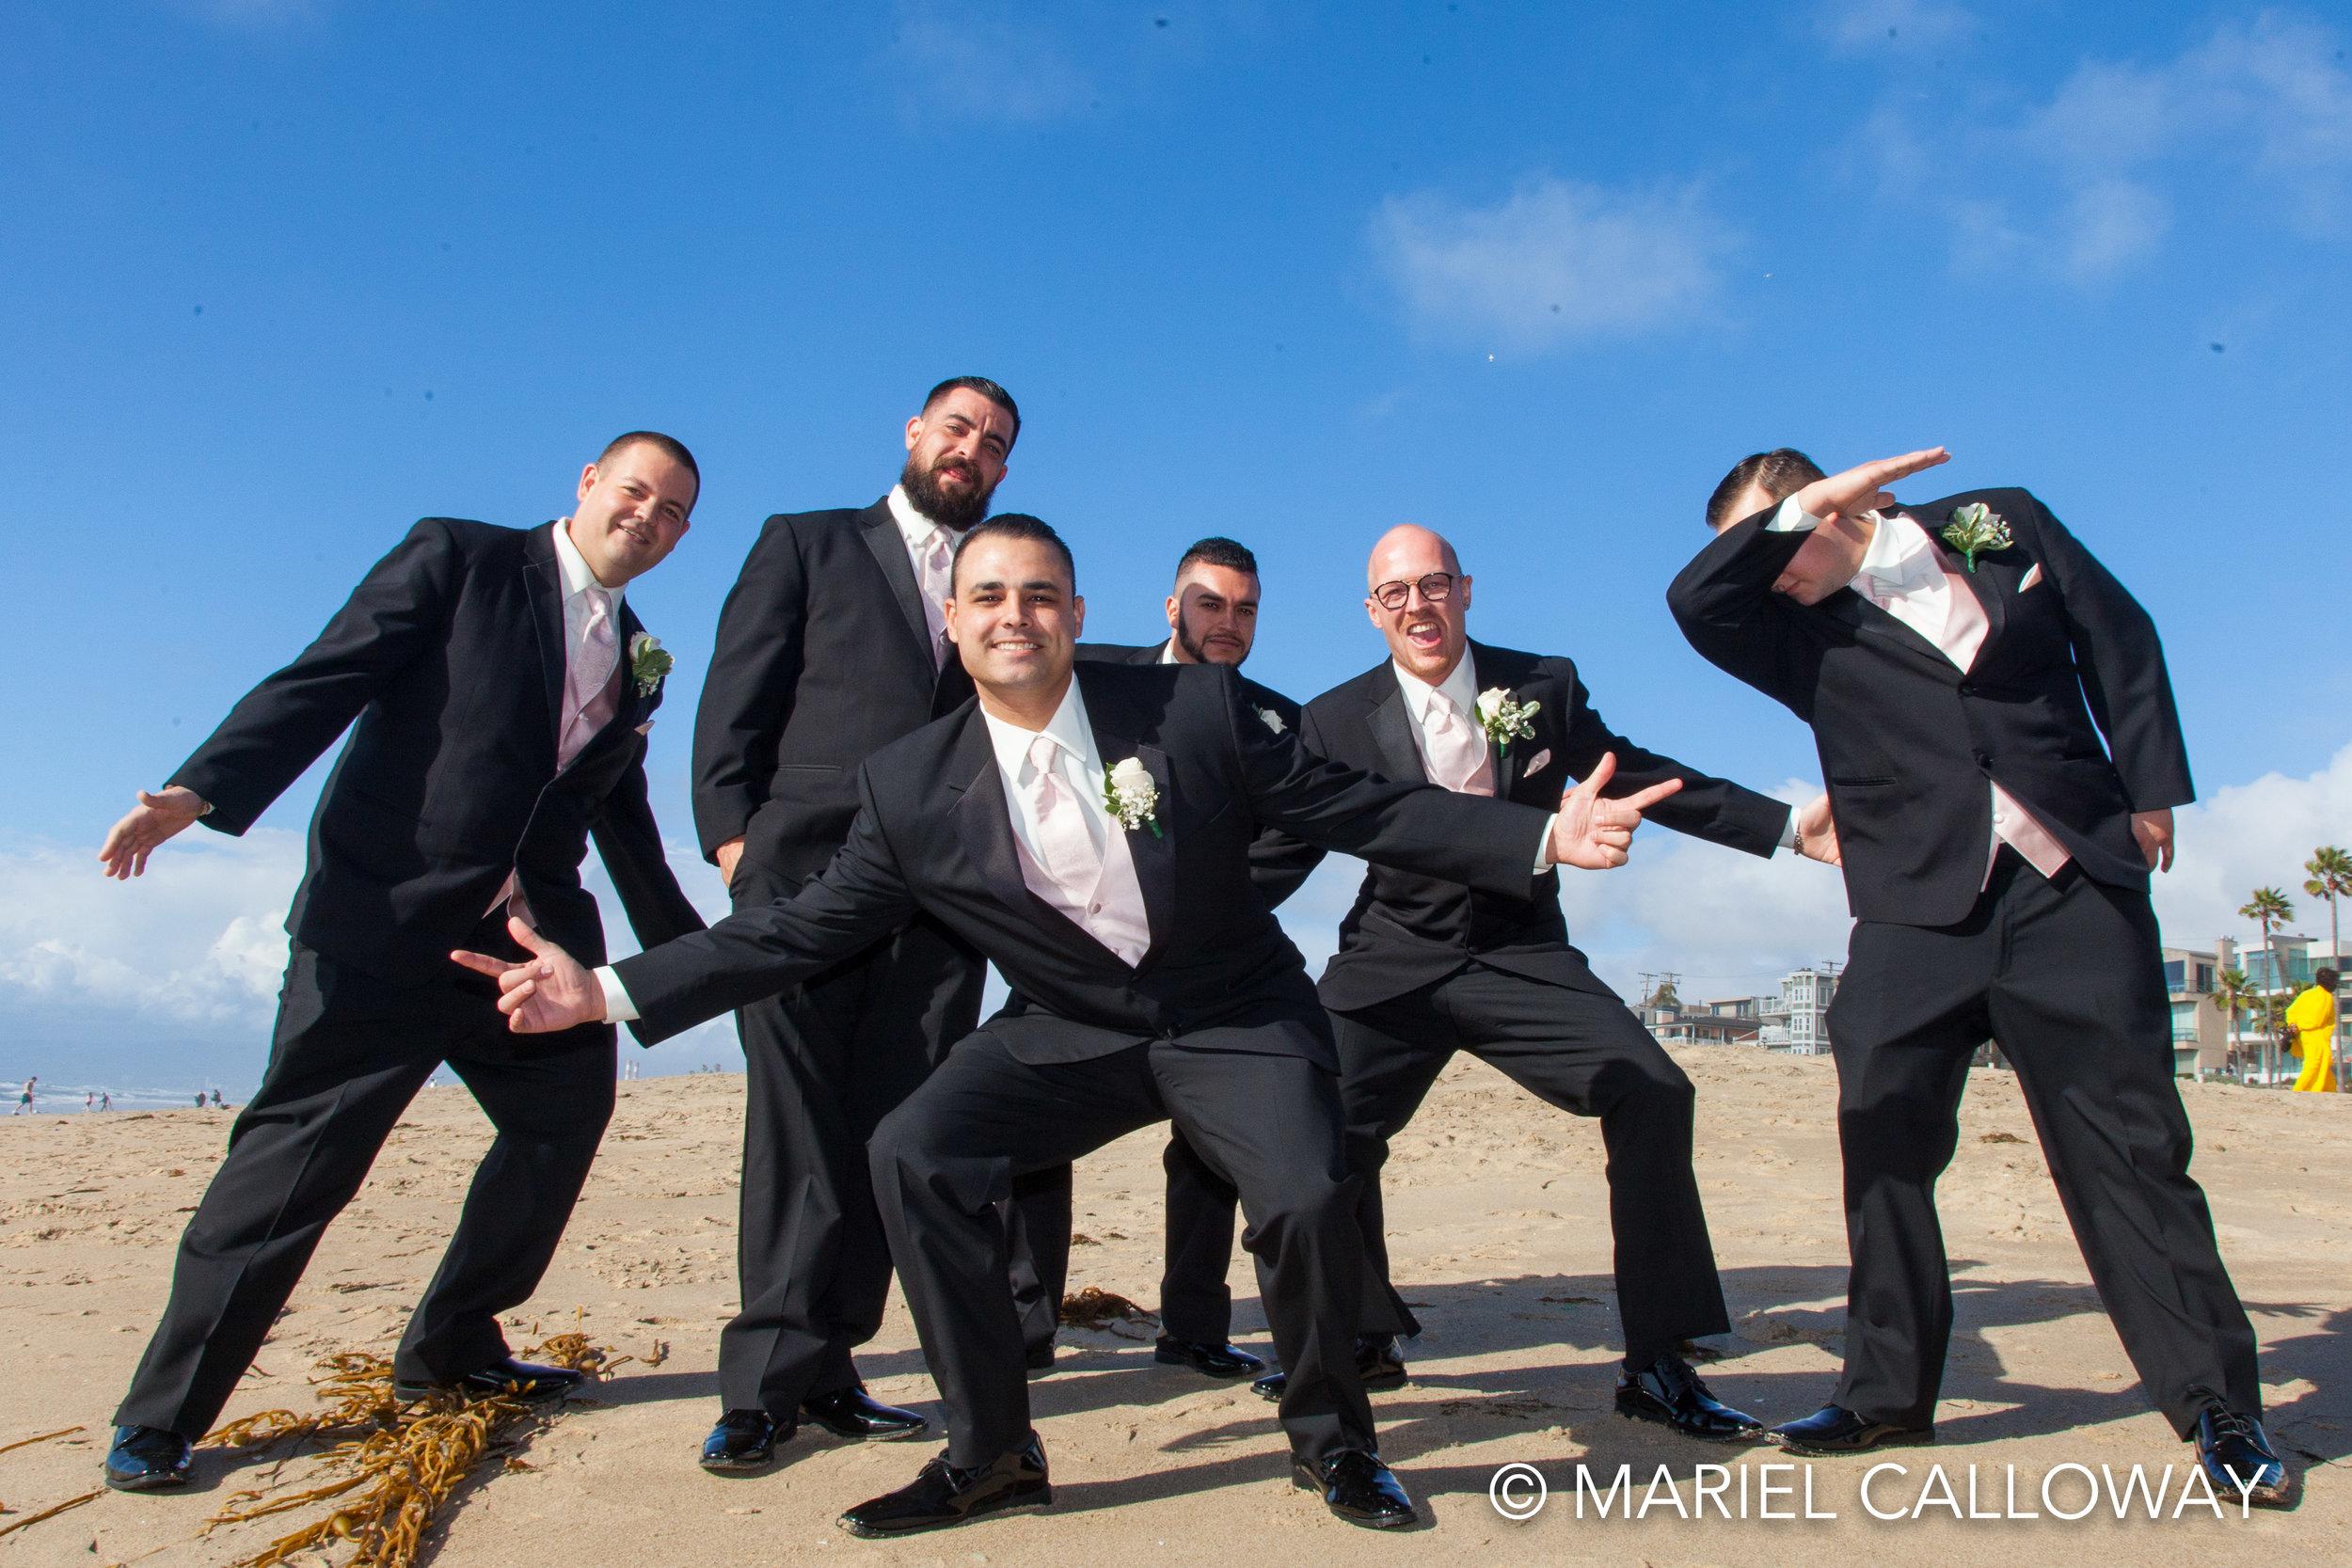 Mariel-Calloway-Los-Angeles-Wedding-Photography-Rossi-54.jpg